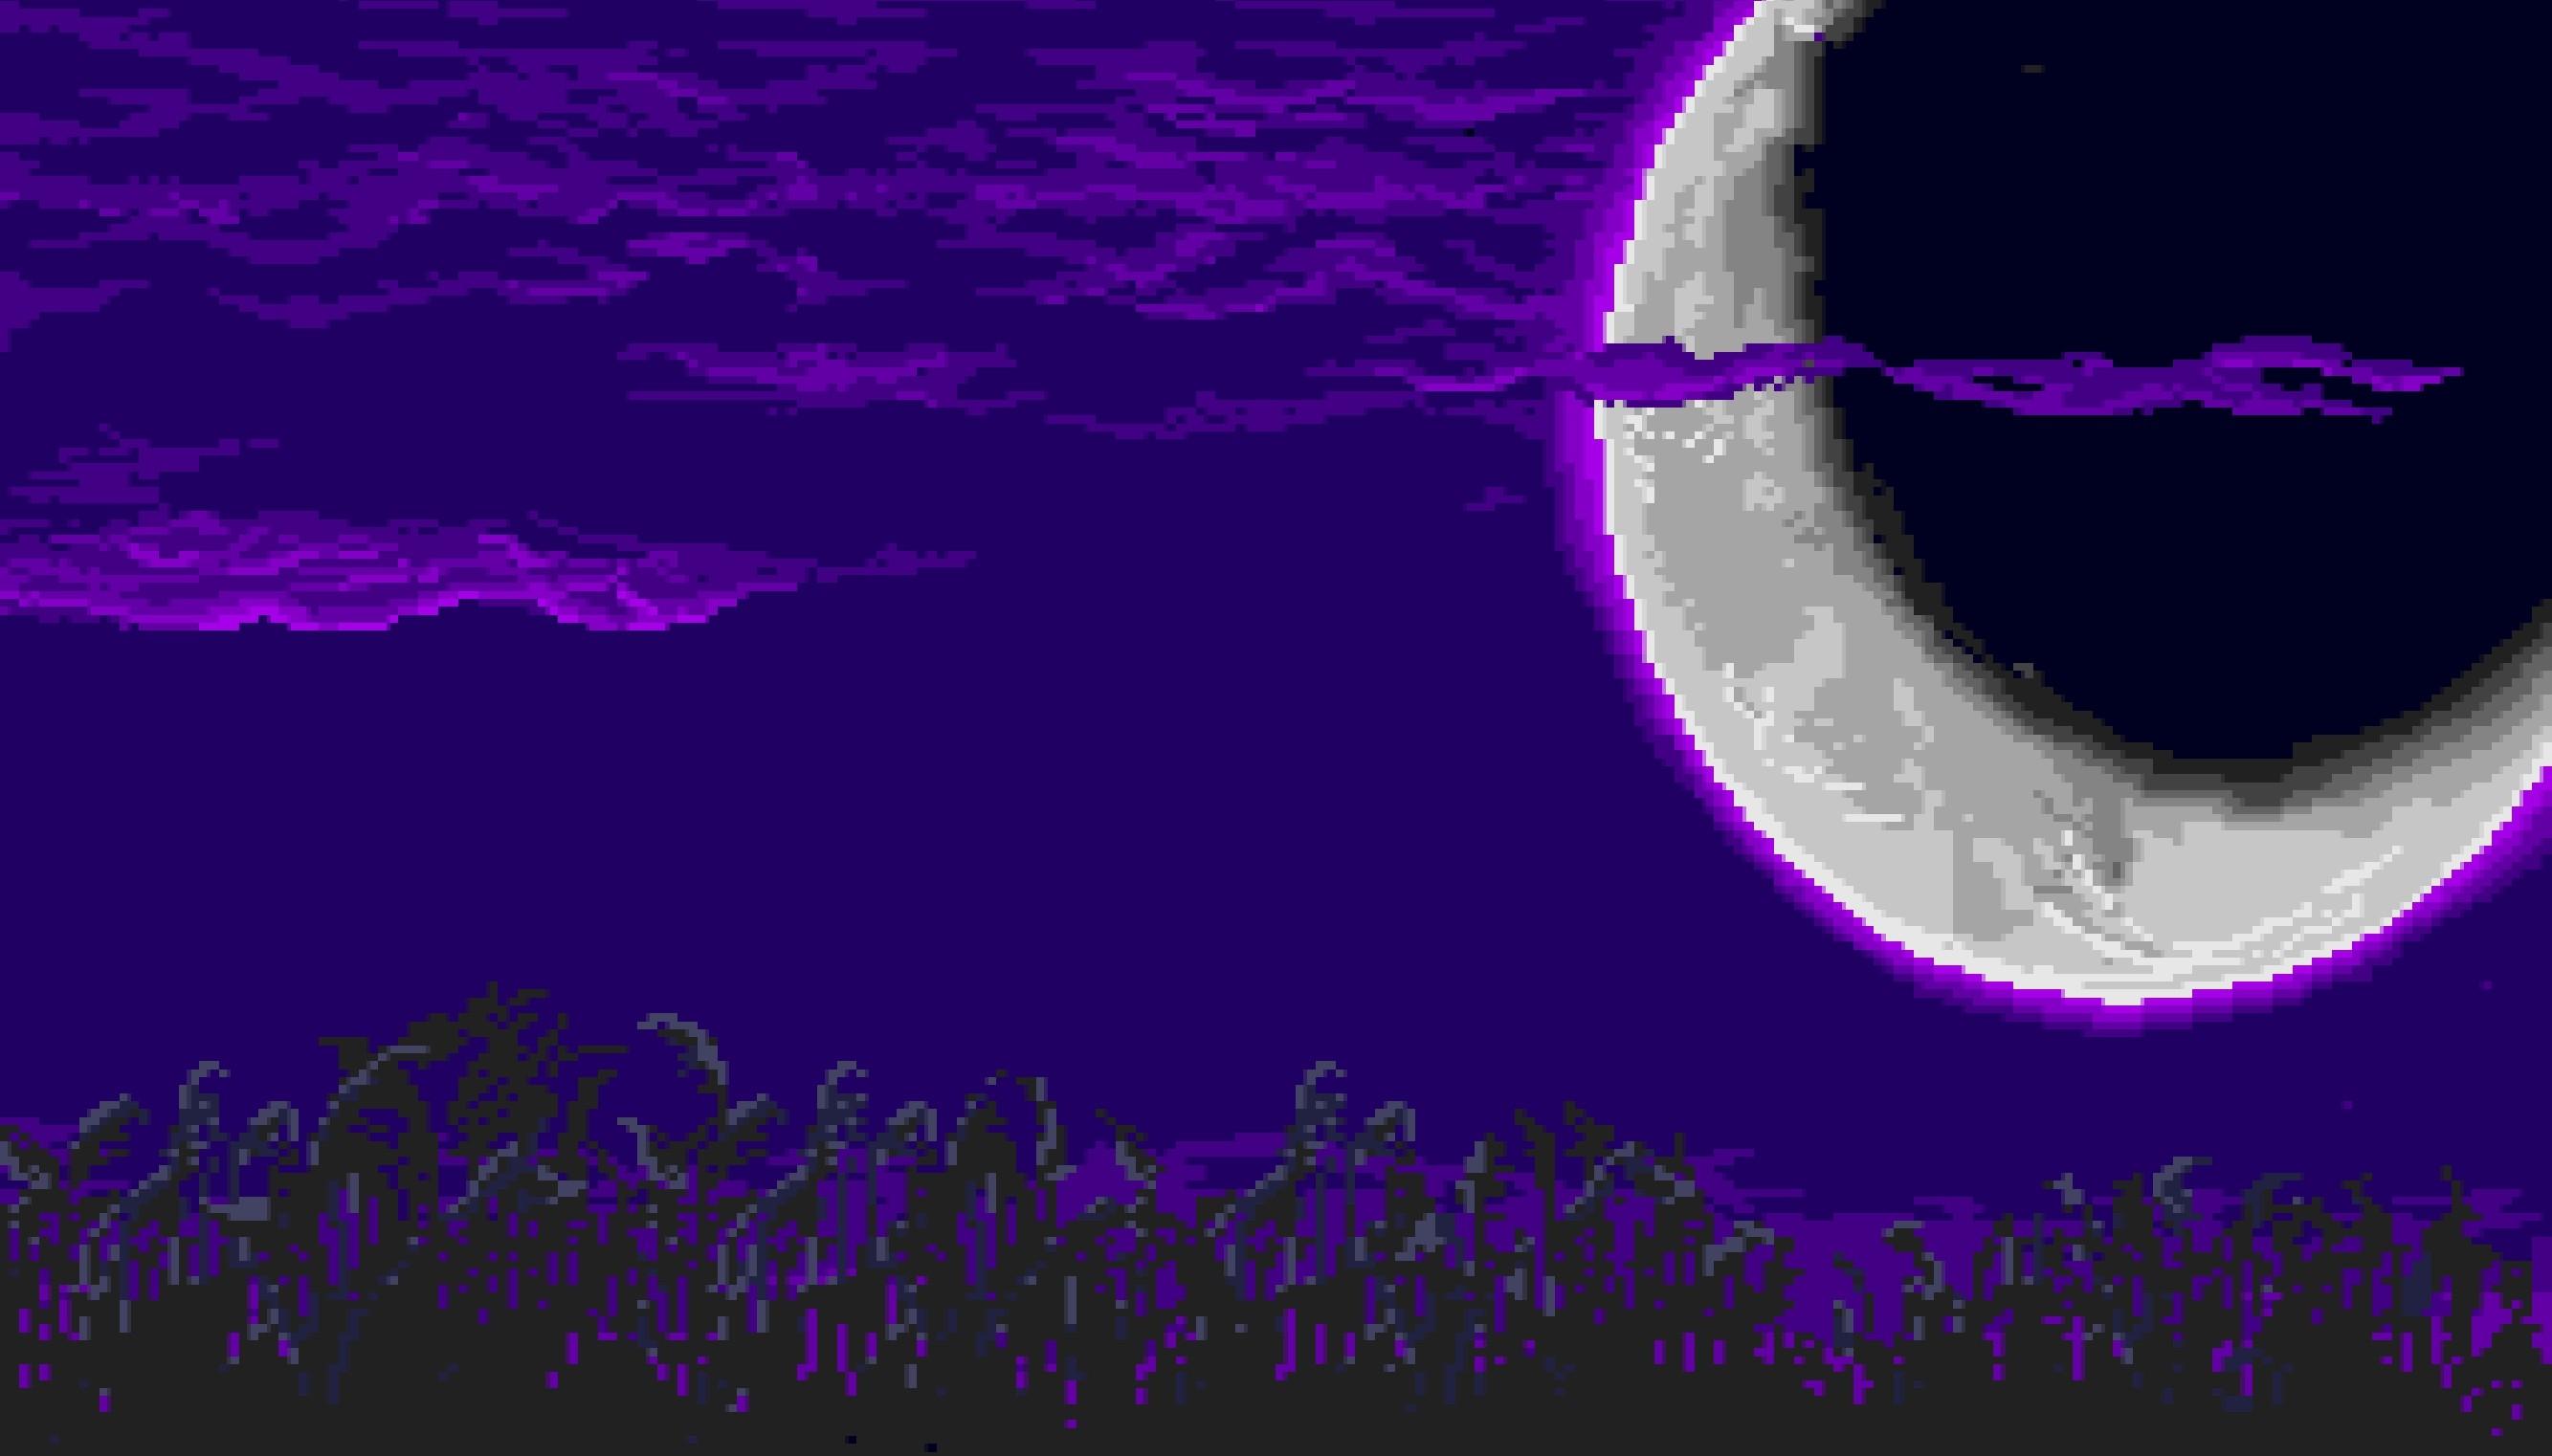 Purple Pixel Background Tumblr